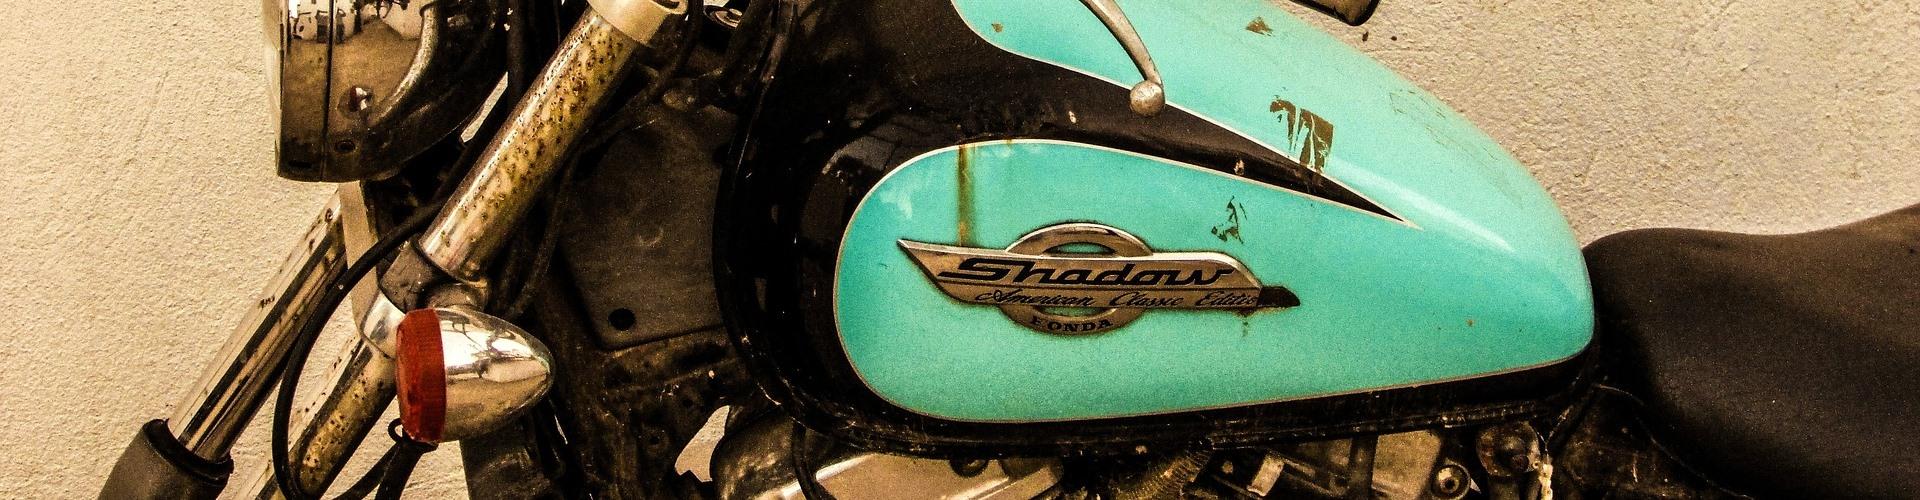 classic honda shadow motorcycle